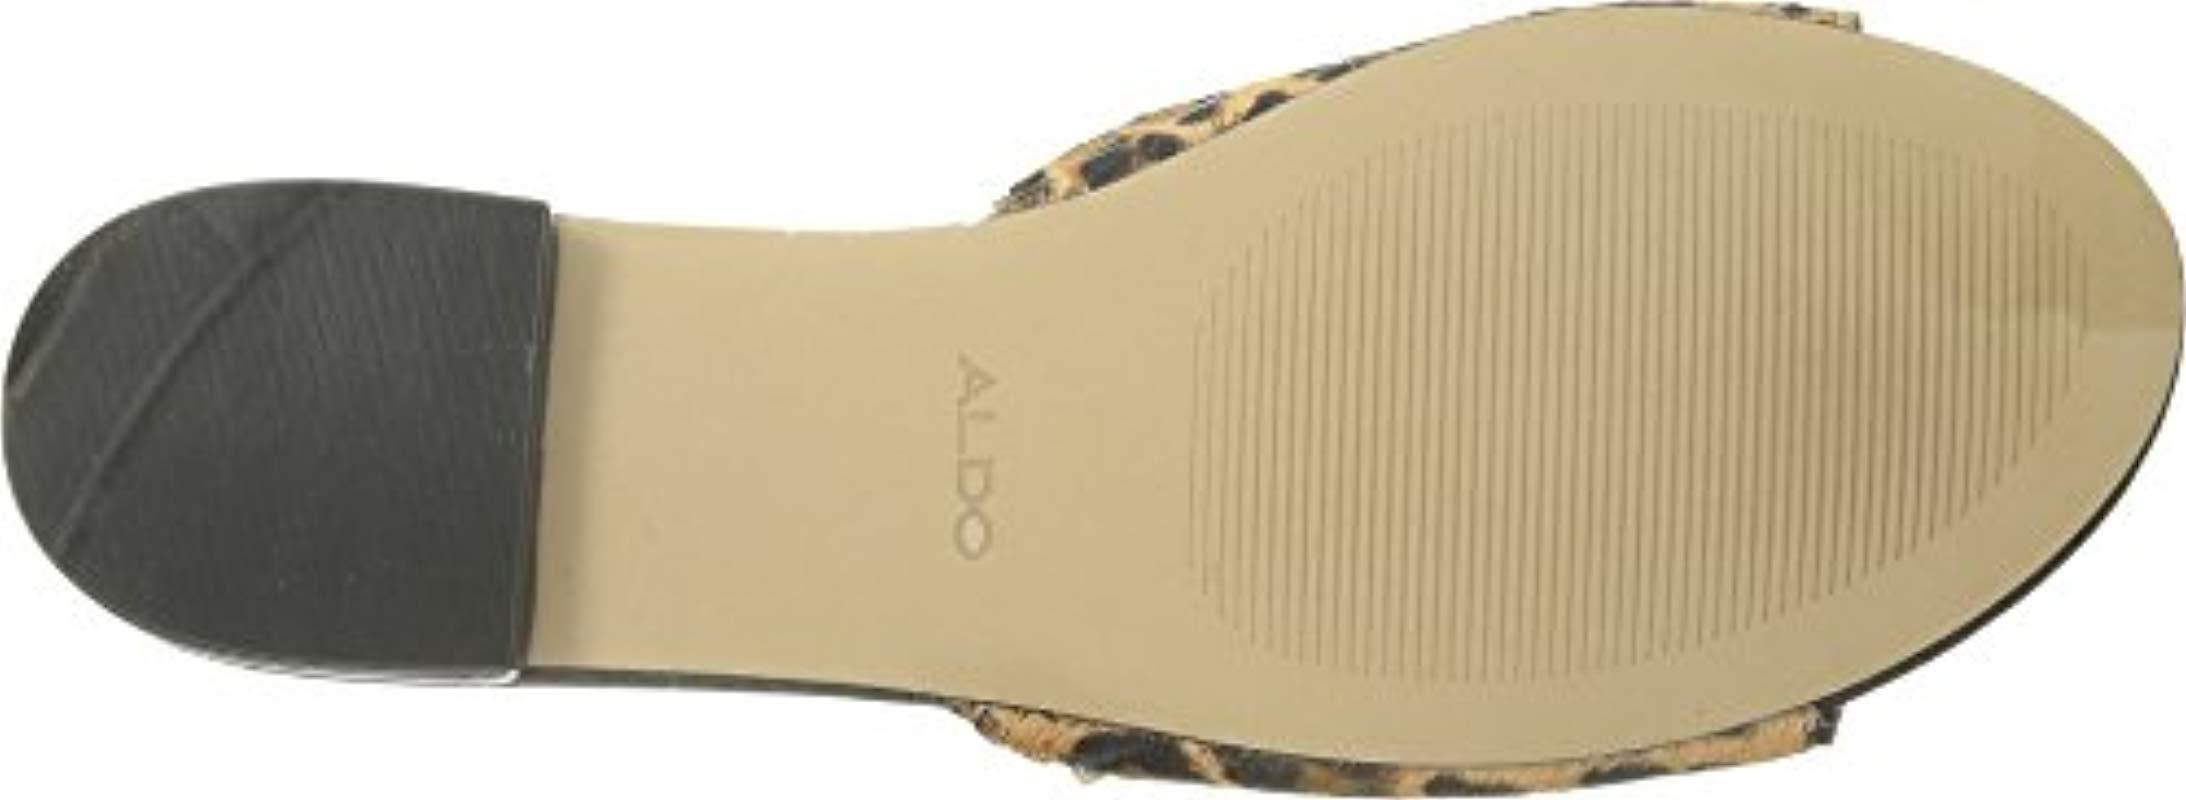 a726d934ea35 ALDO - Multicolor Thoalle Slide Sandal - Lyst. View fullscreen